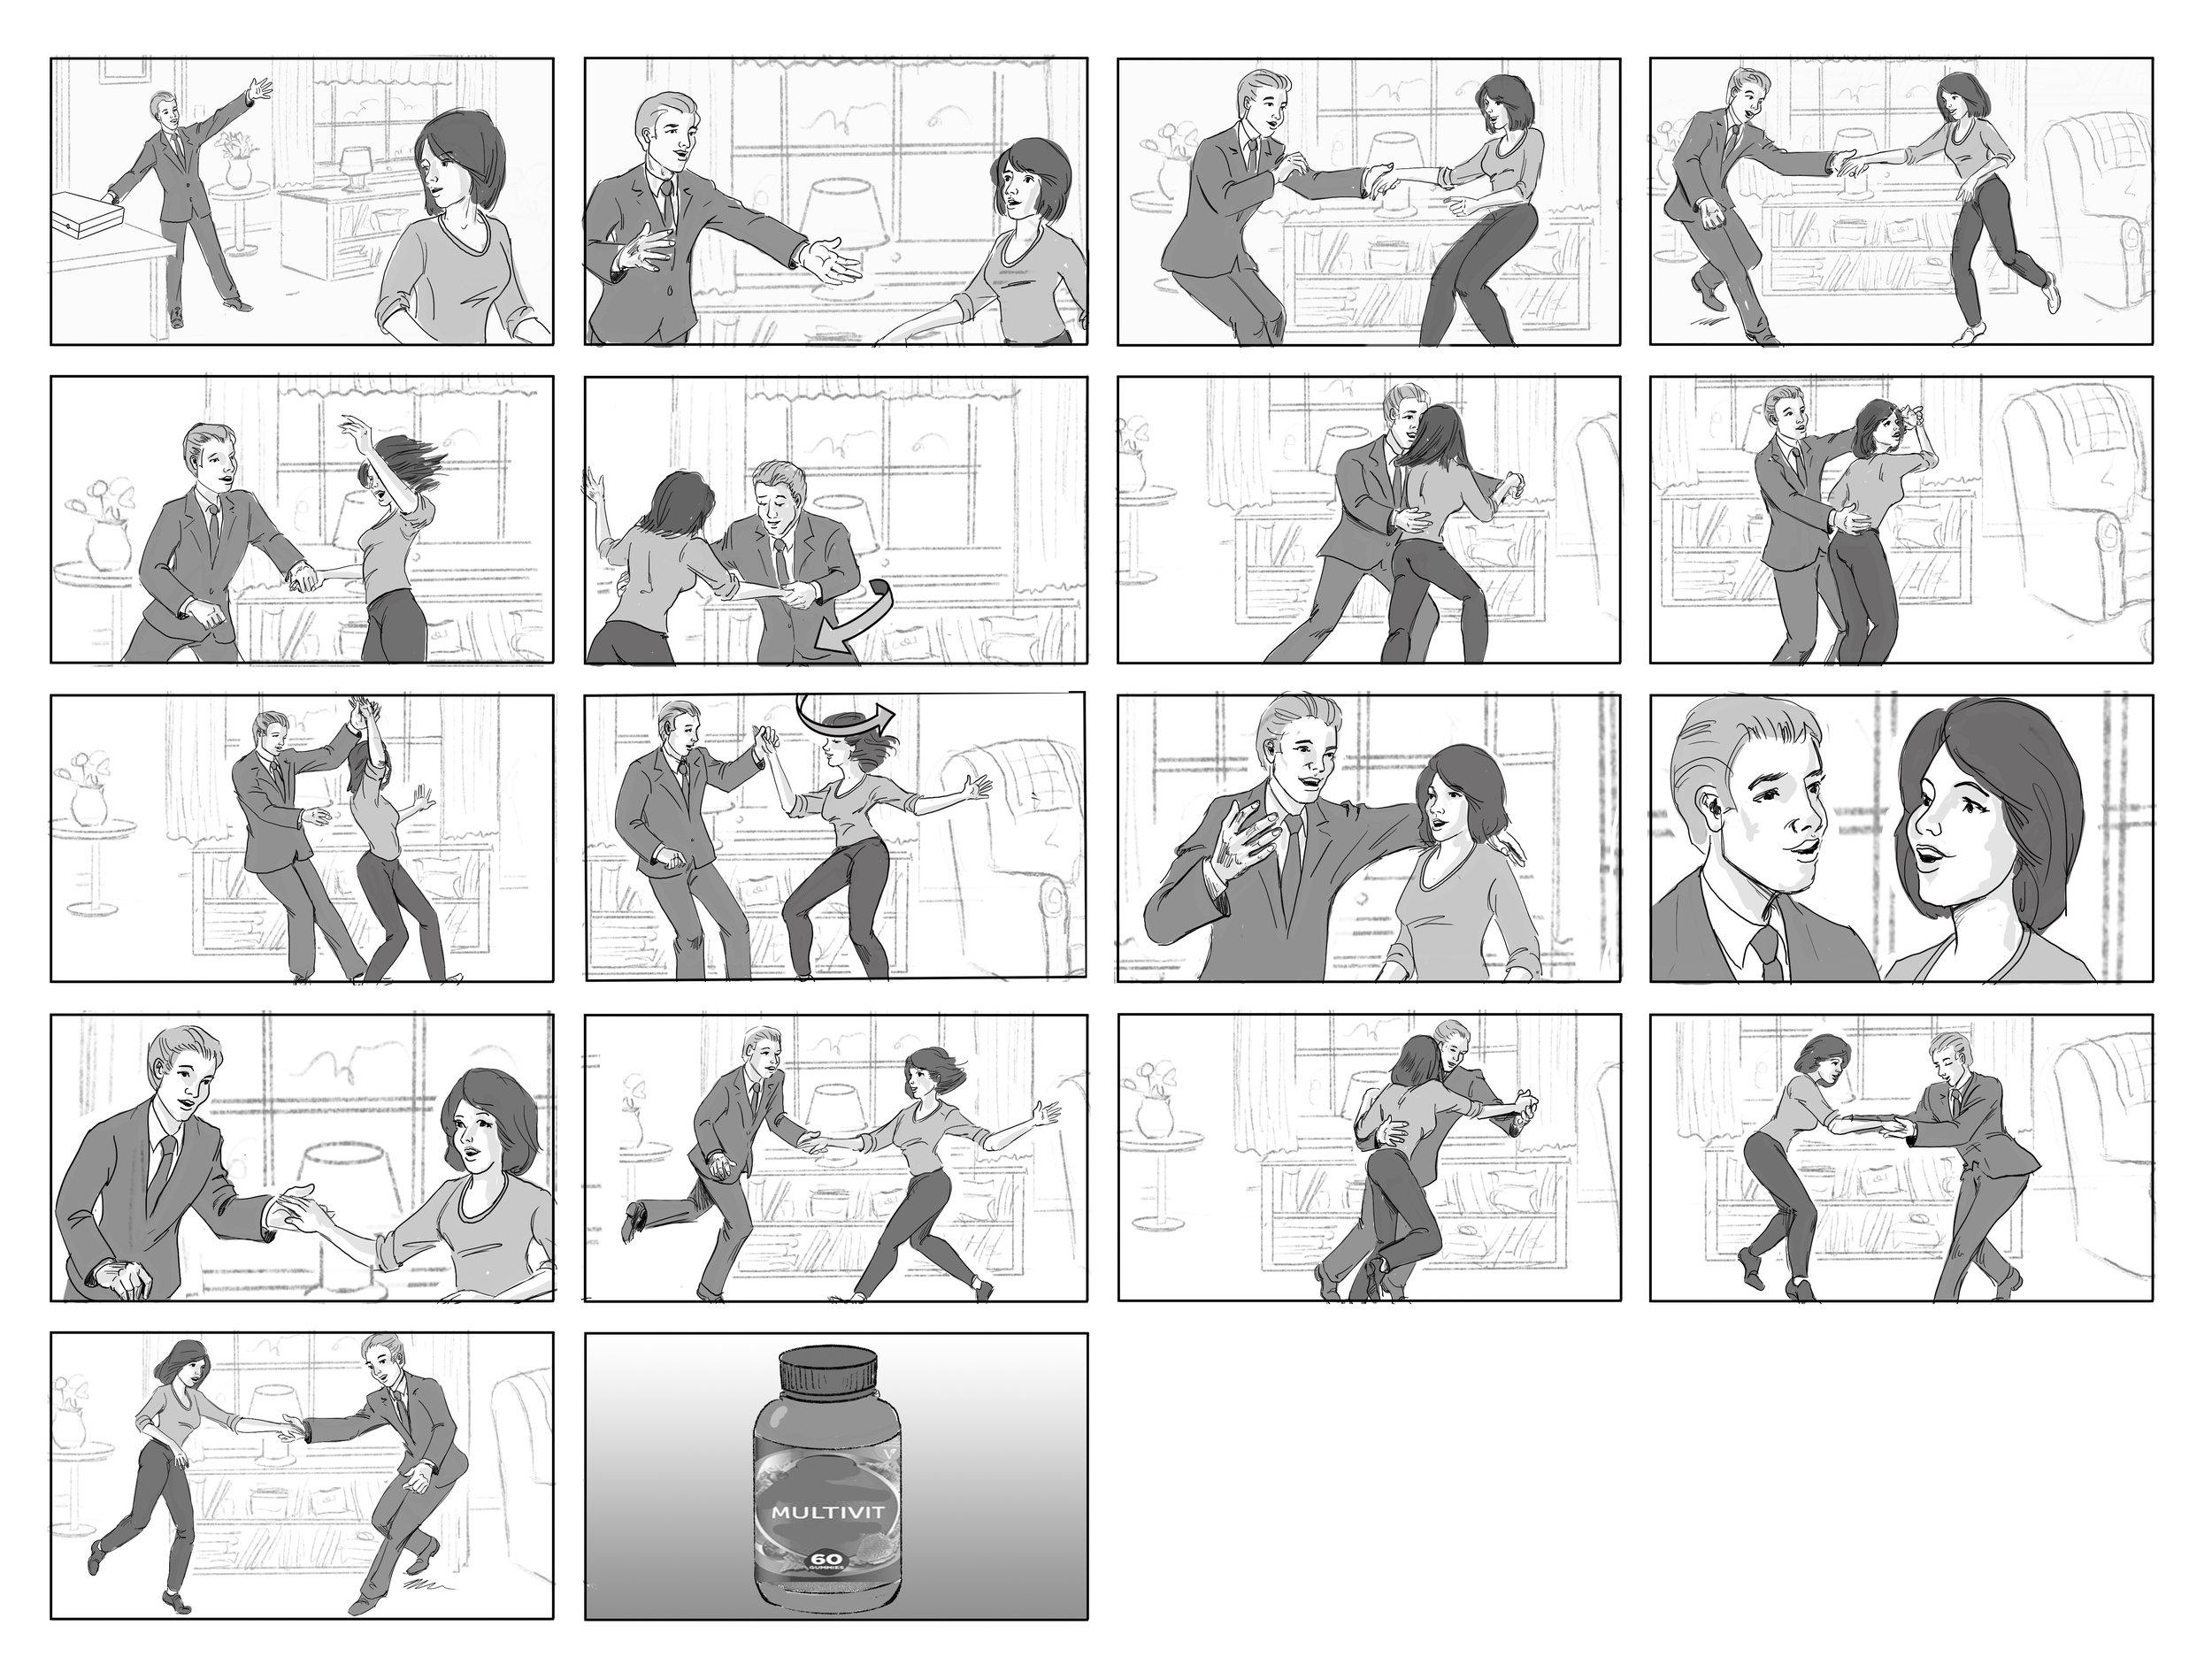 Dancing_2_18_frames.jpg